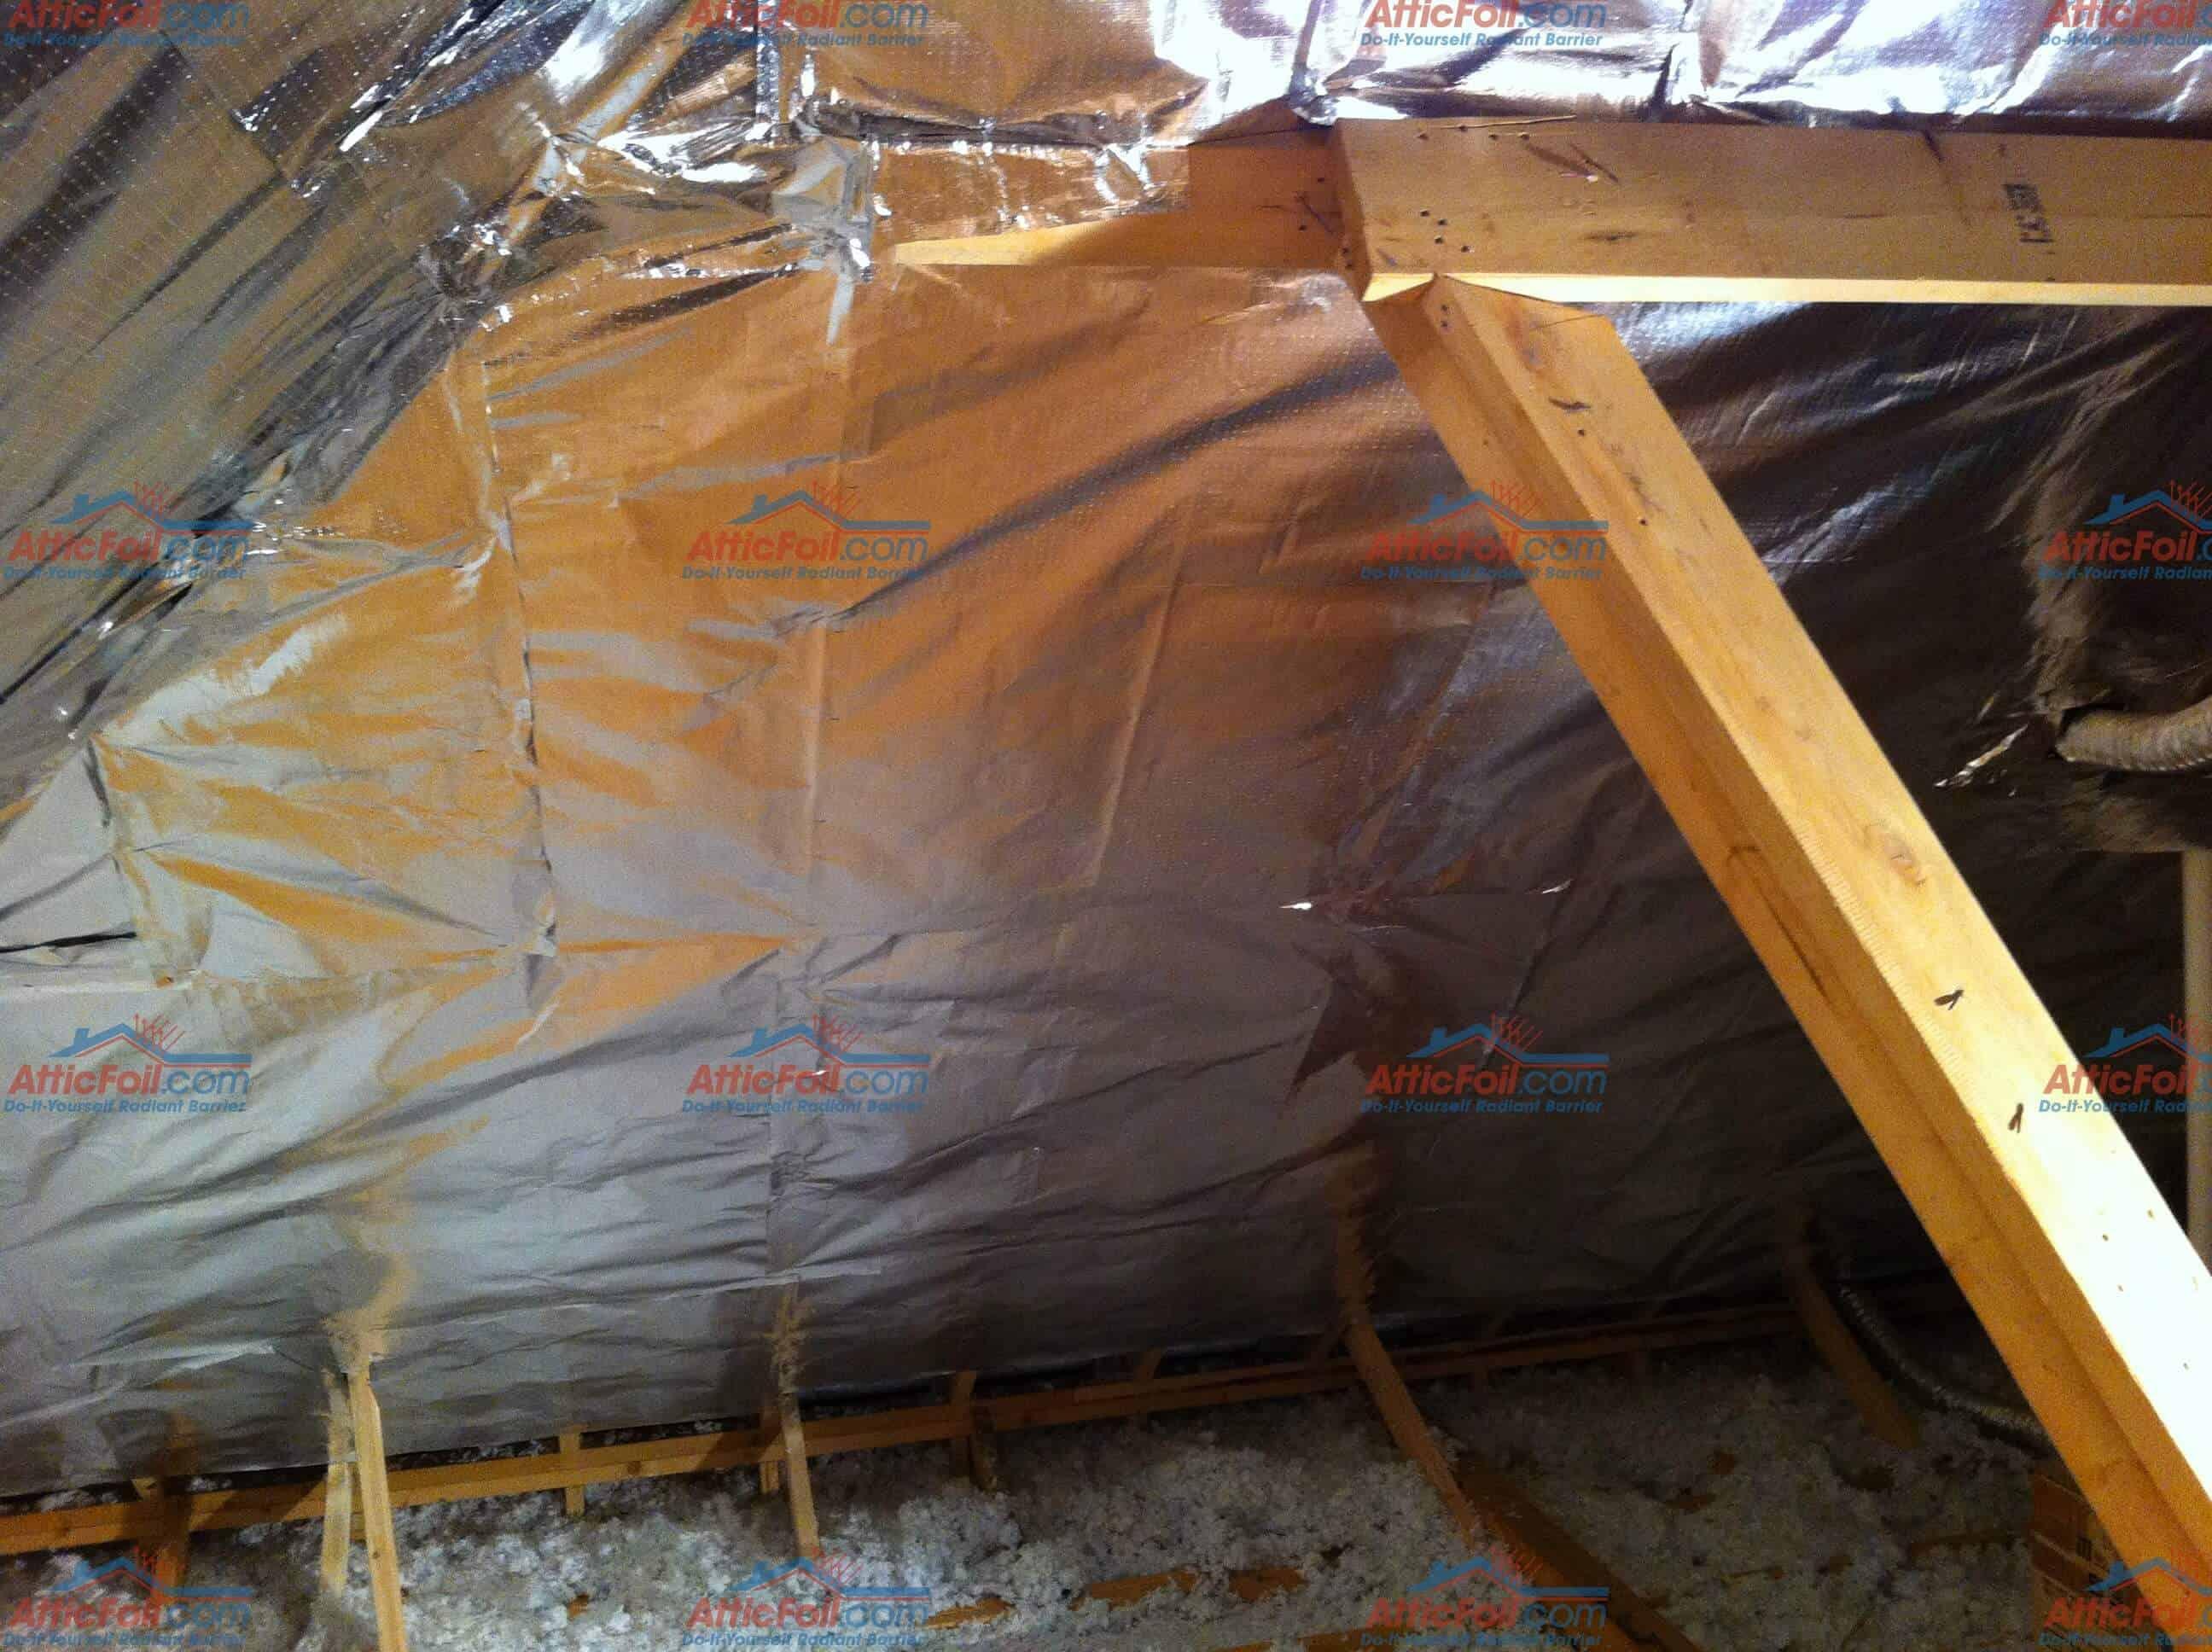 Gallery Staple Up Installs Atticfoil Radiant Barrier